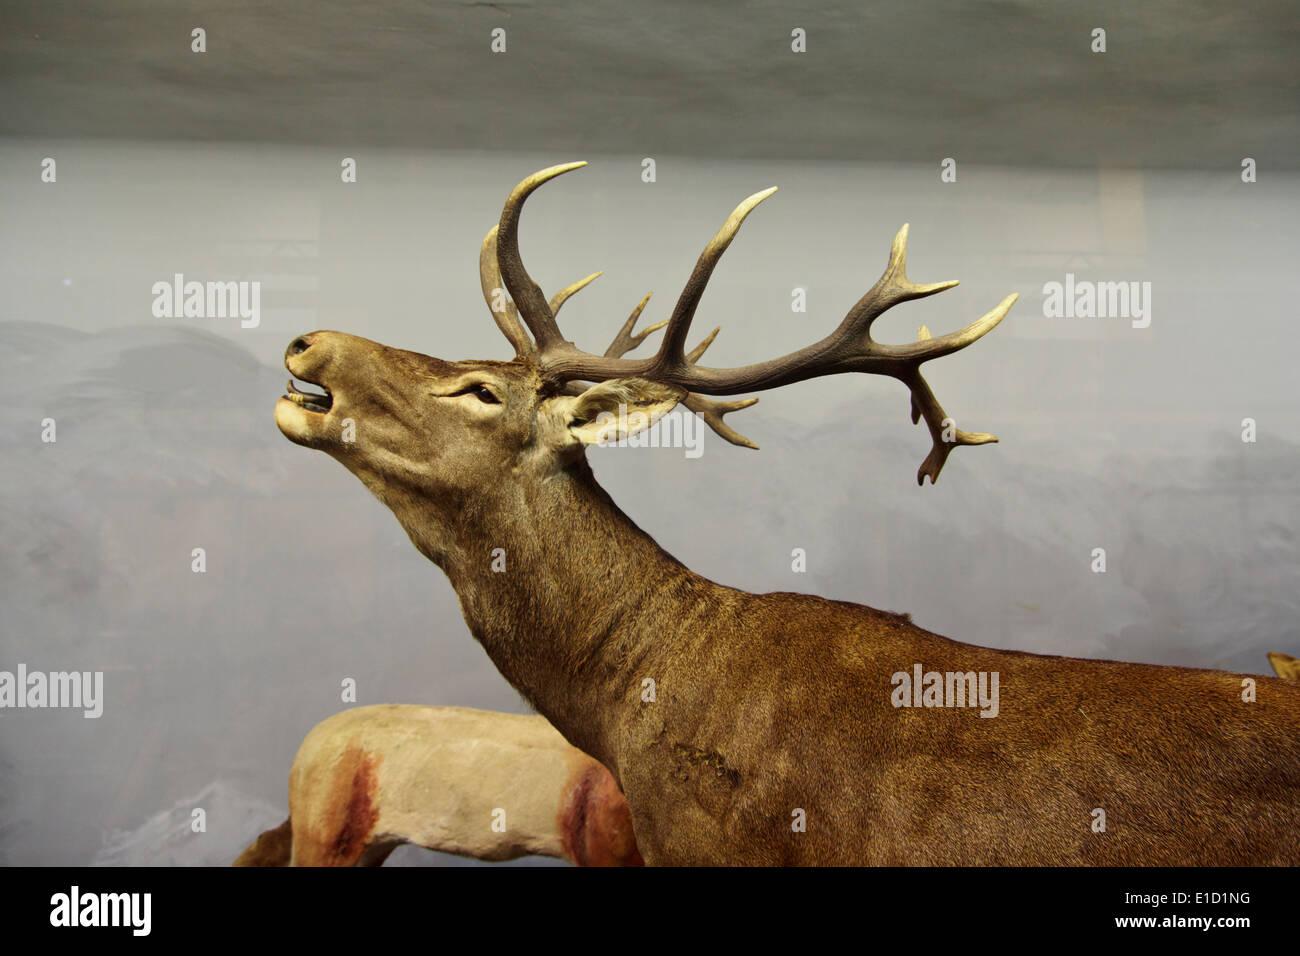 Wild Stag Display in the 'El Carmen' Natural History Museum in Onda, Spain - Stock Image